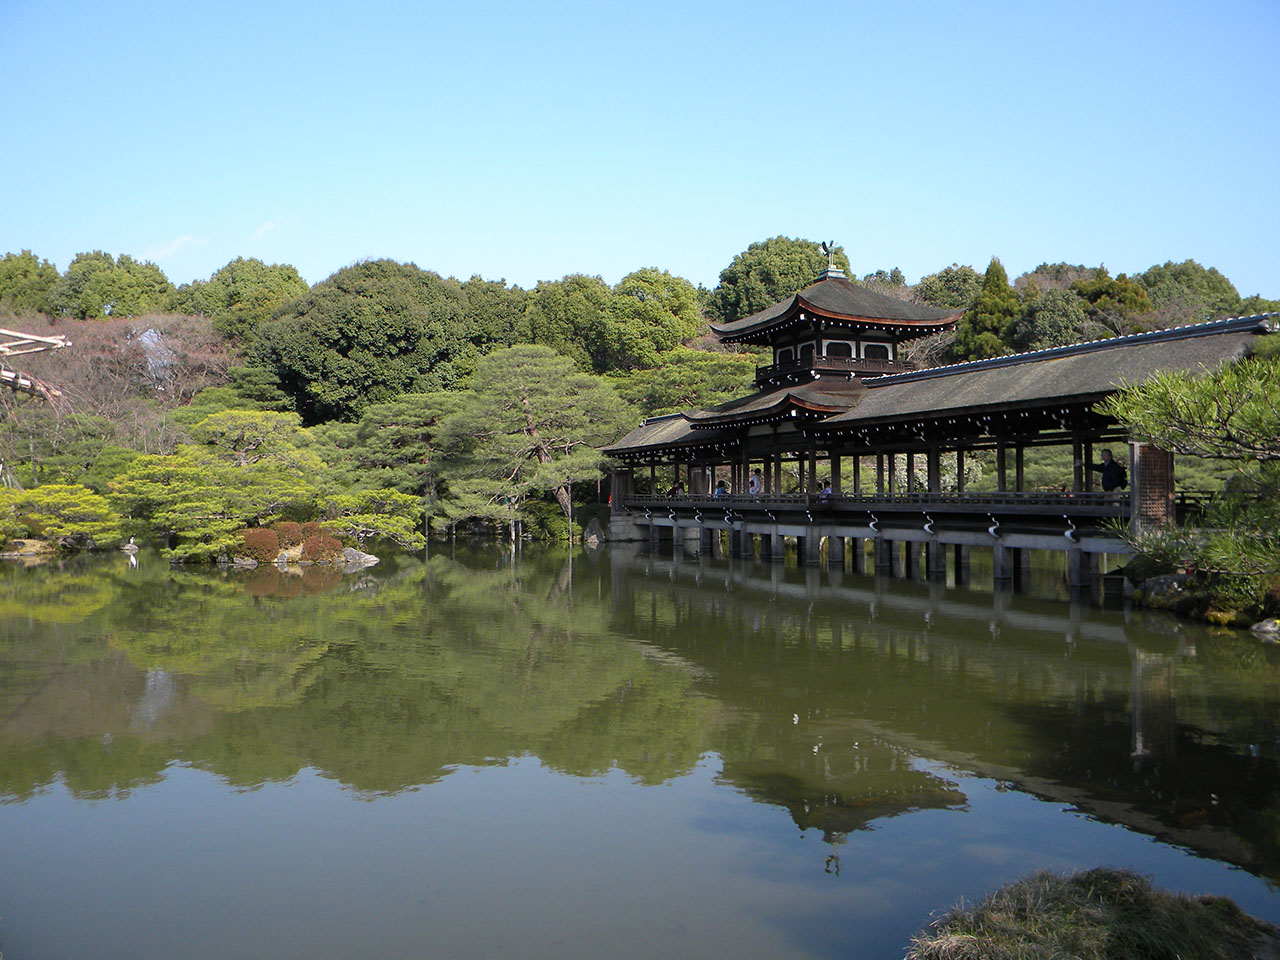 @ Kyoto